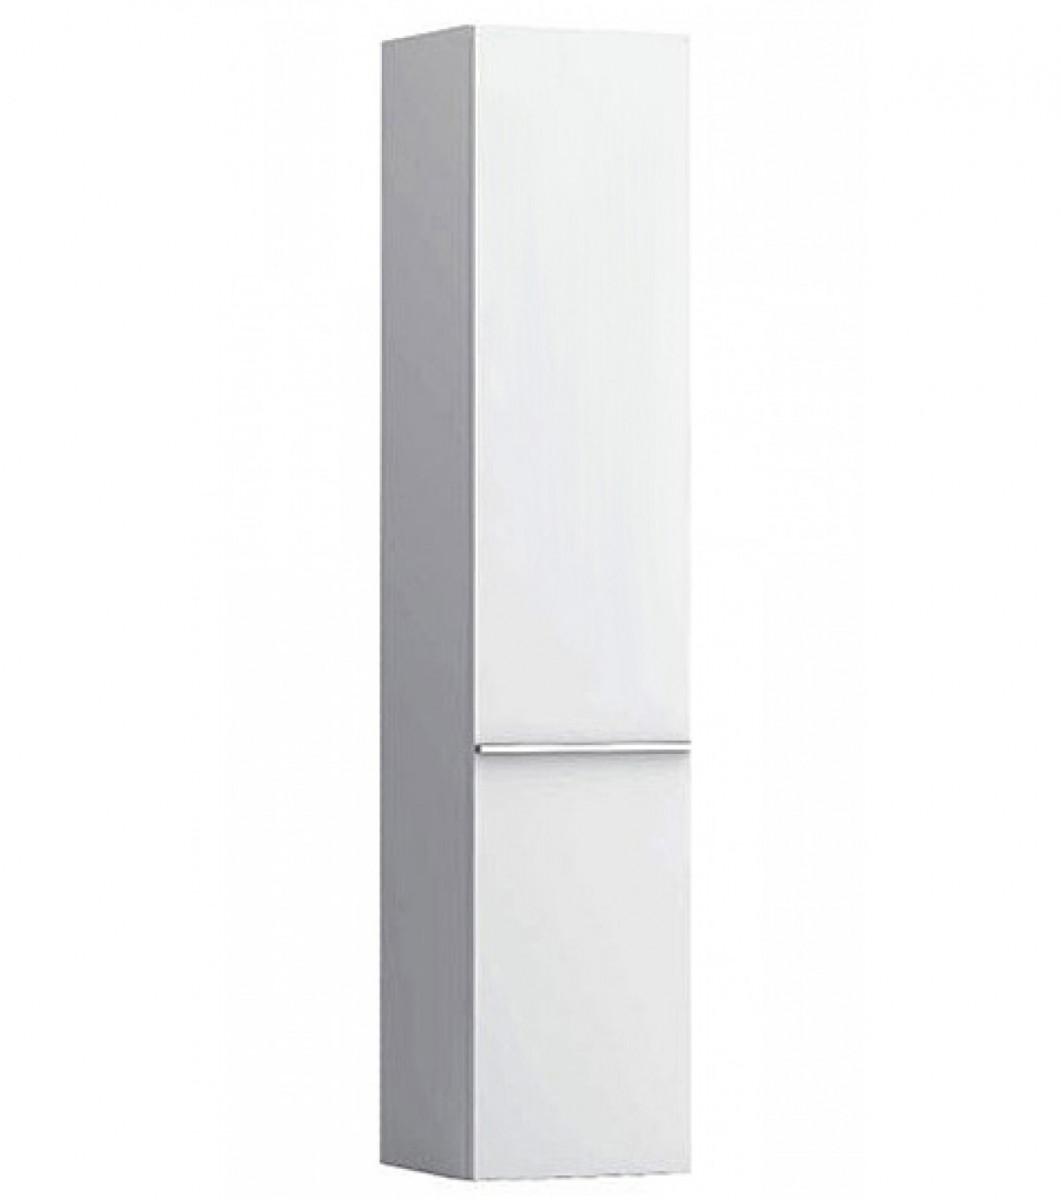 Шкаф навесной Laufen Case 4.0202.1.075.463.1